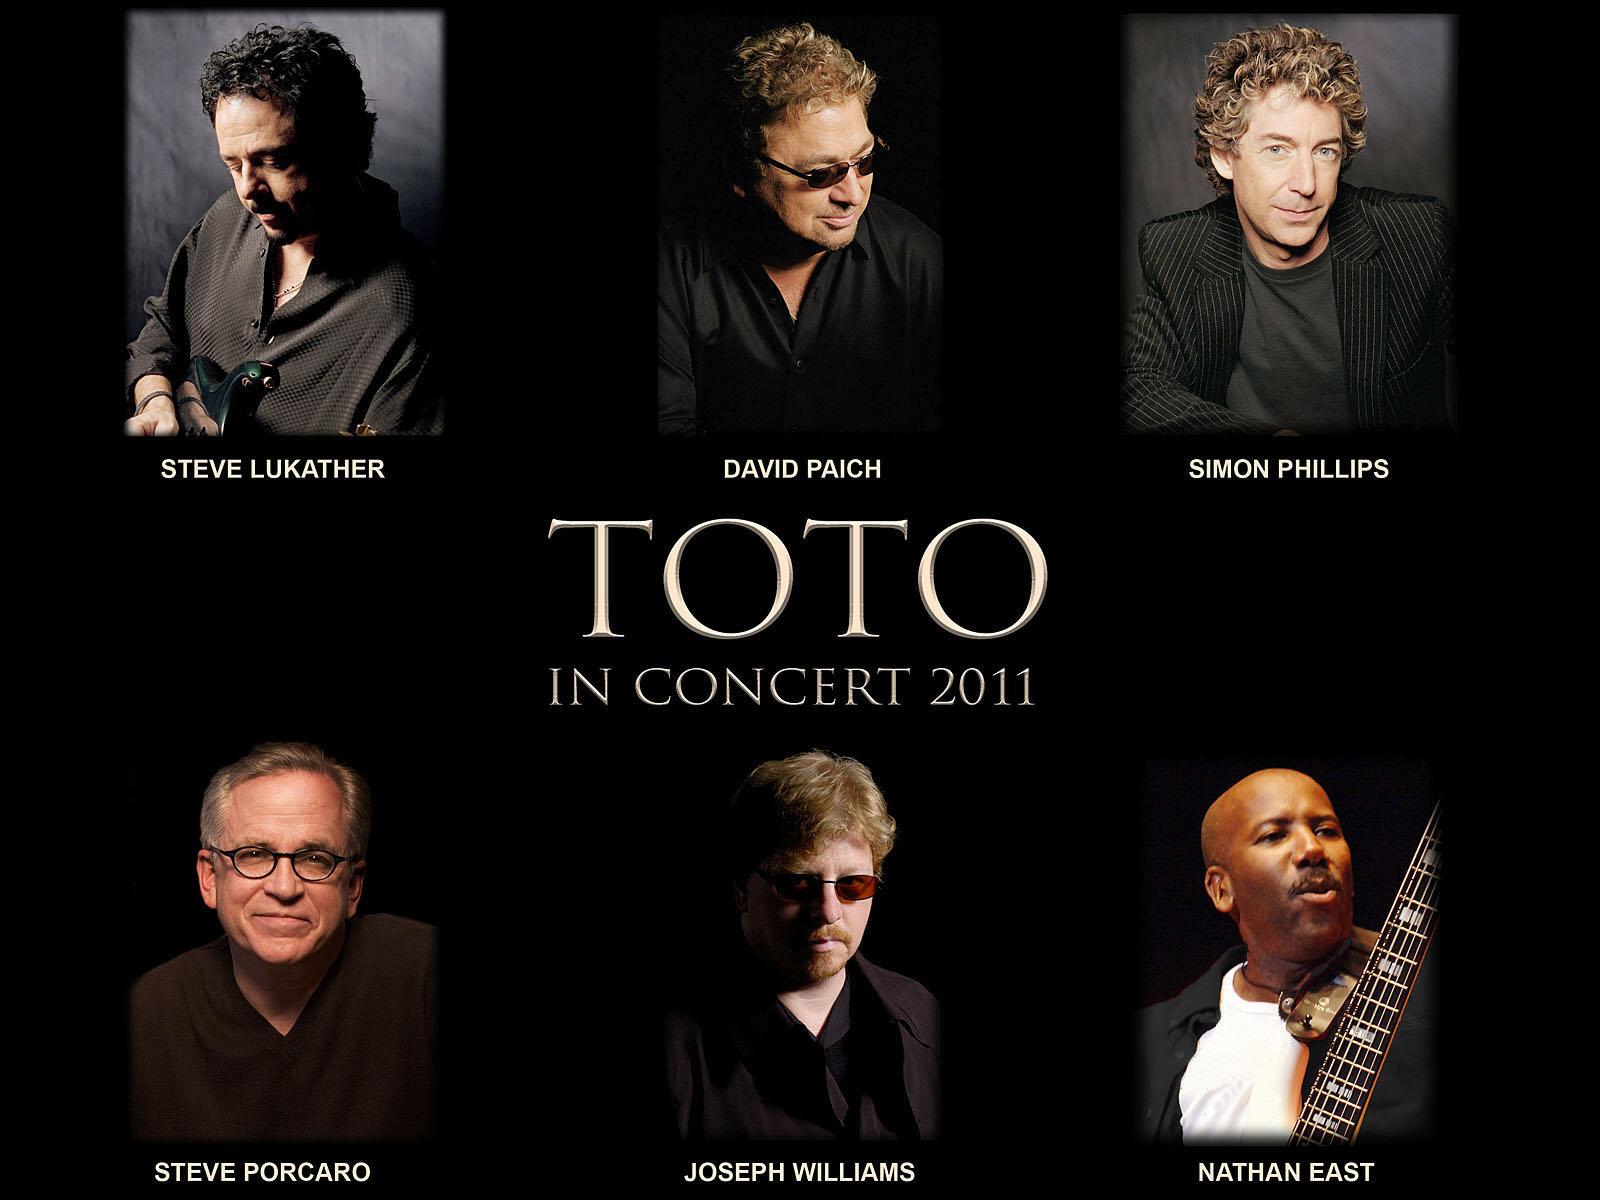 www.toto99.com - Official TOTO Website - Media - Computer